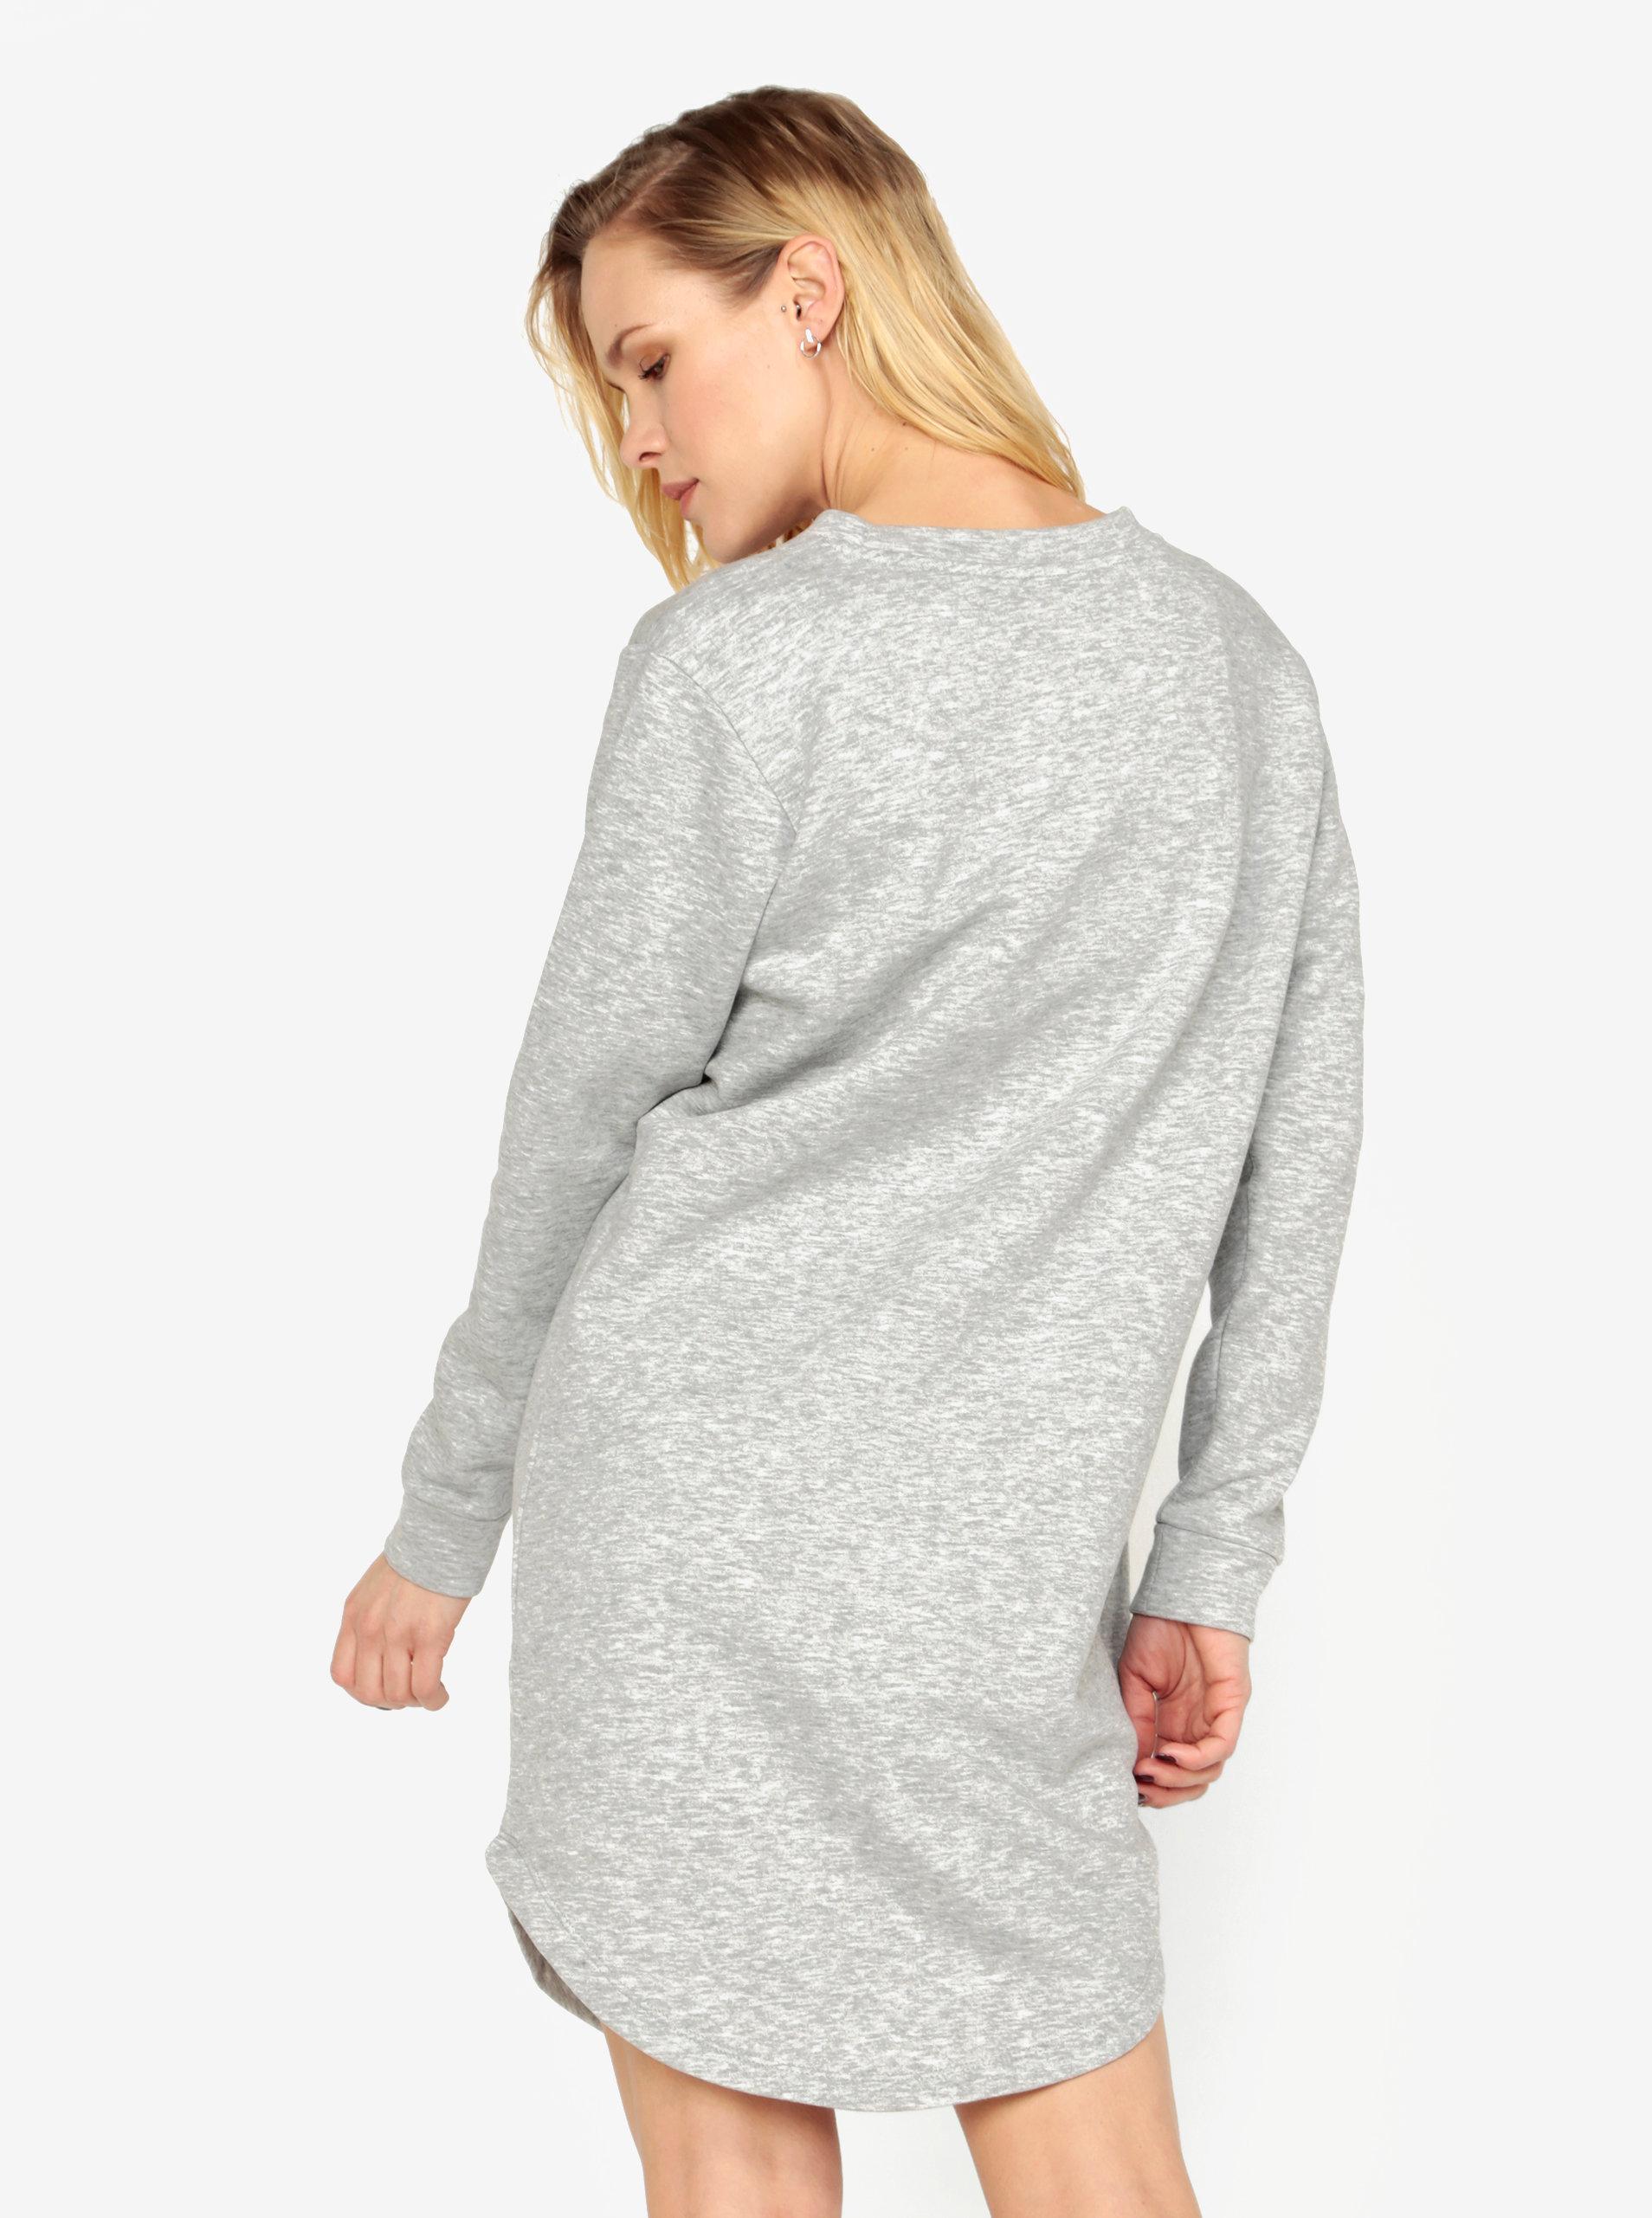 150cdac8a6bd Sivé mikinové šaty s dlhým rukávom Jacqueline de Yong Tori ...